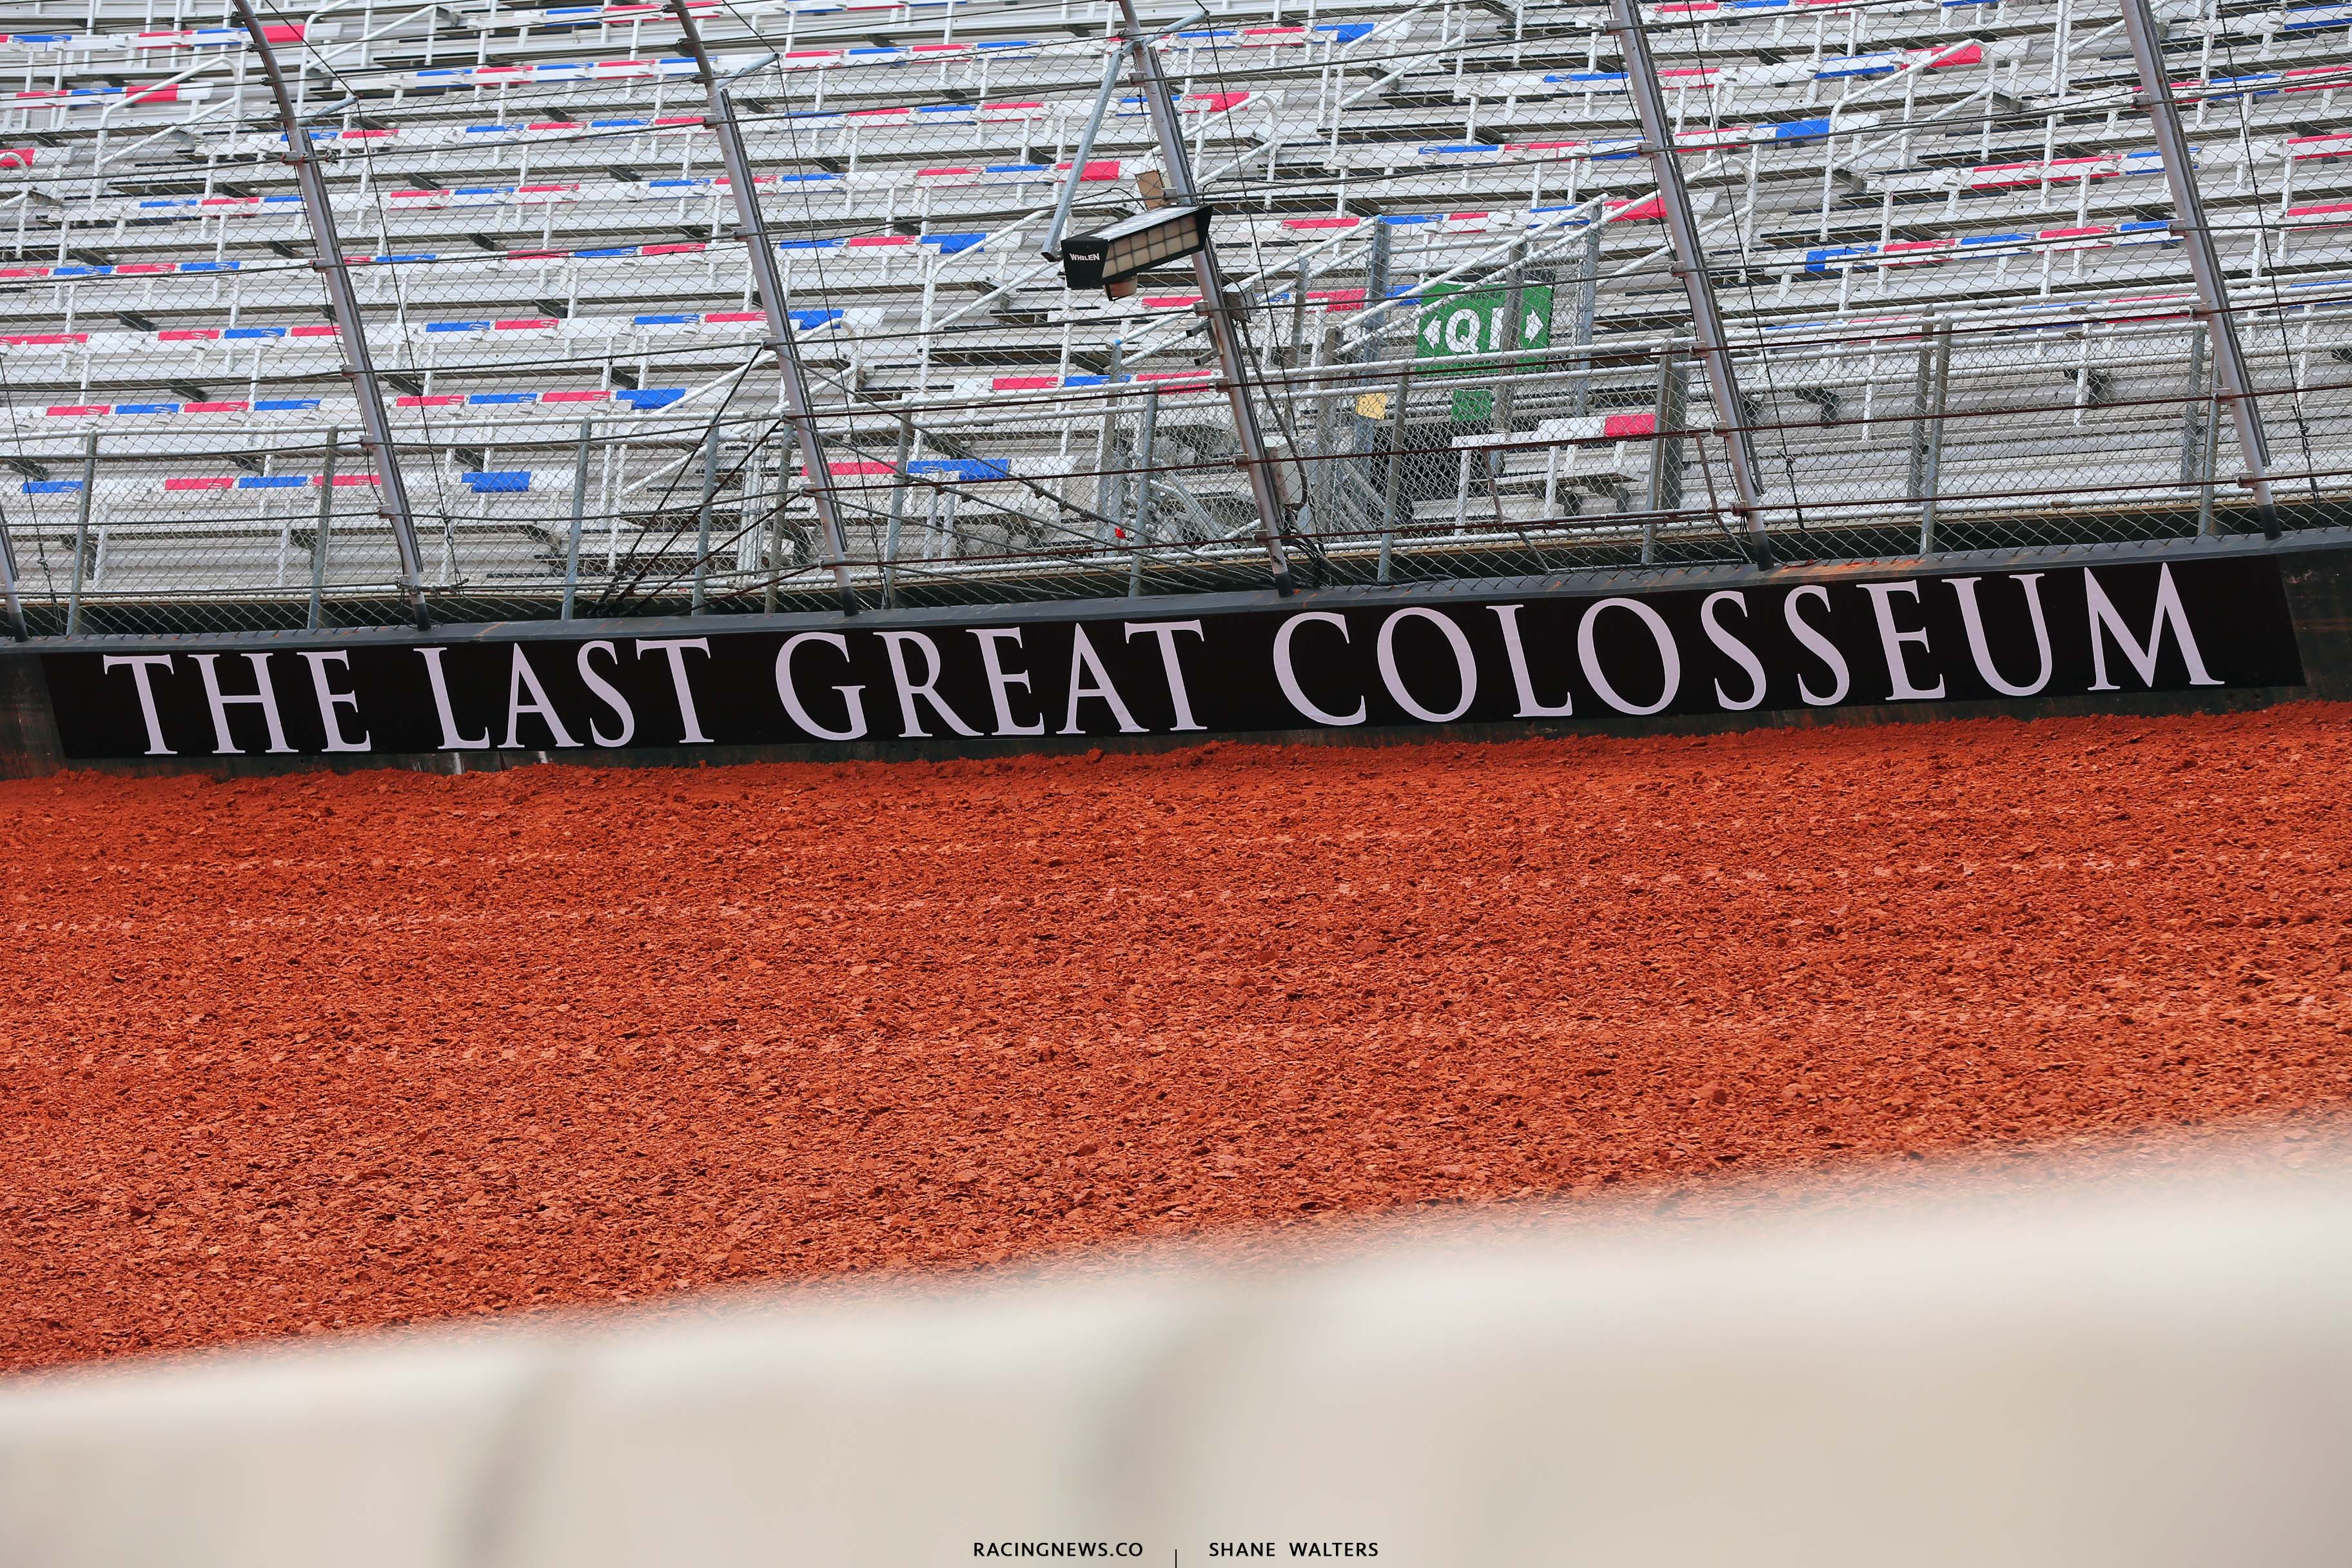 The Last Great Colosseum - Bristol Motor Speedway dirt track